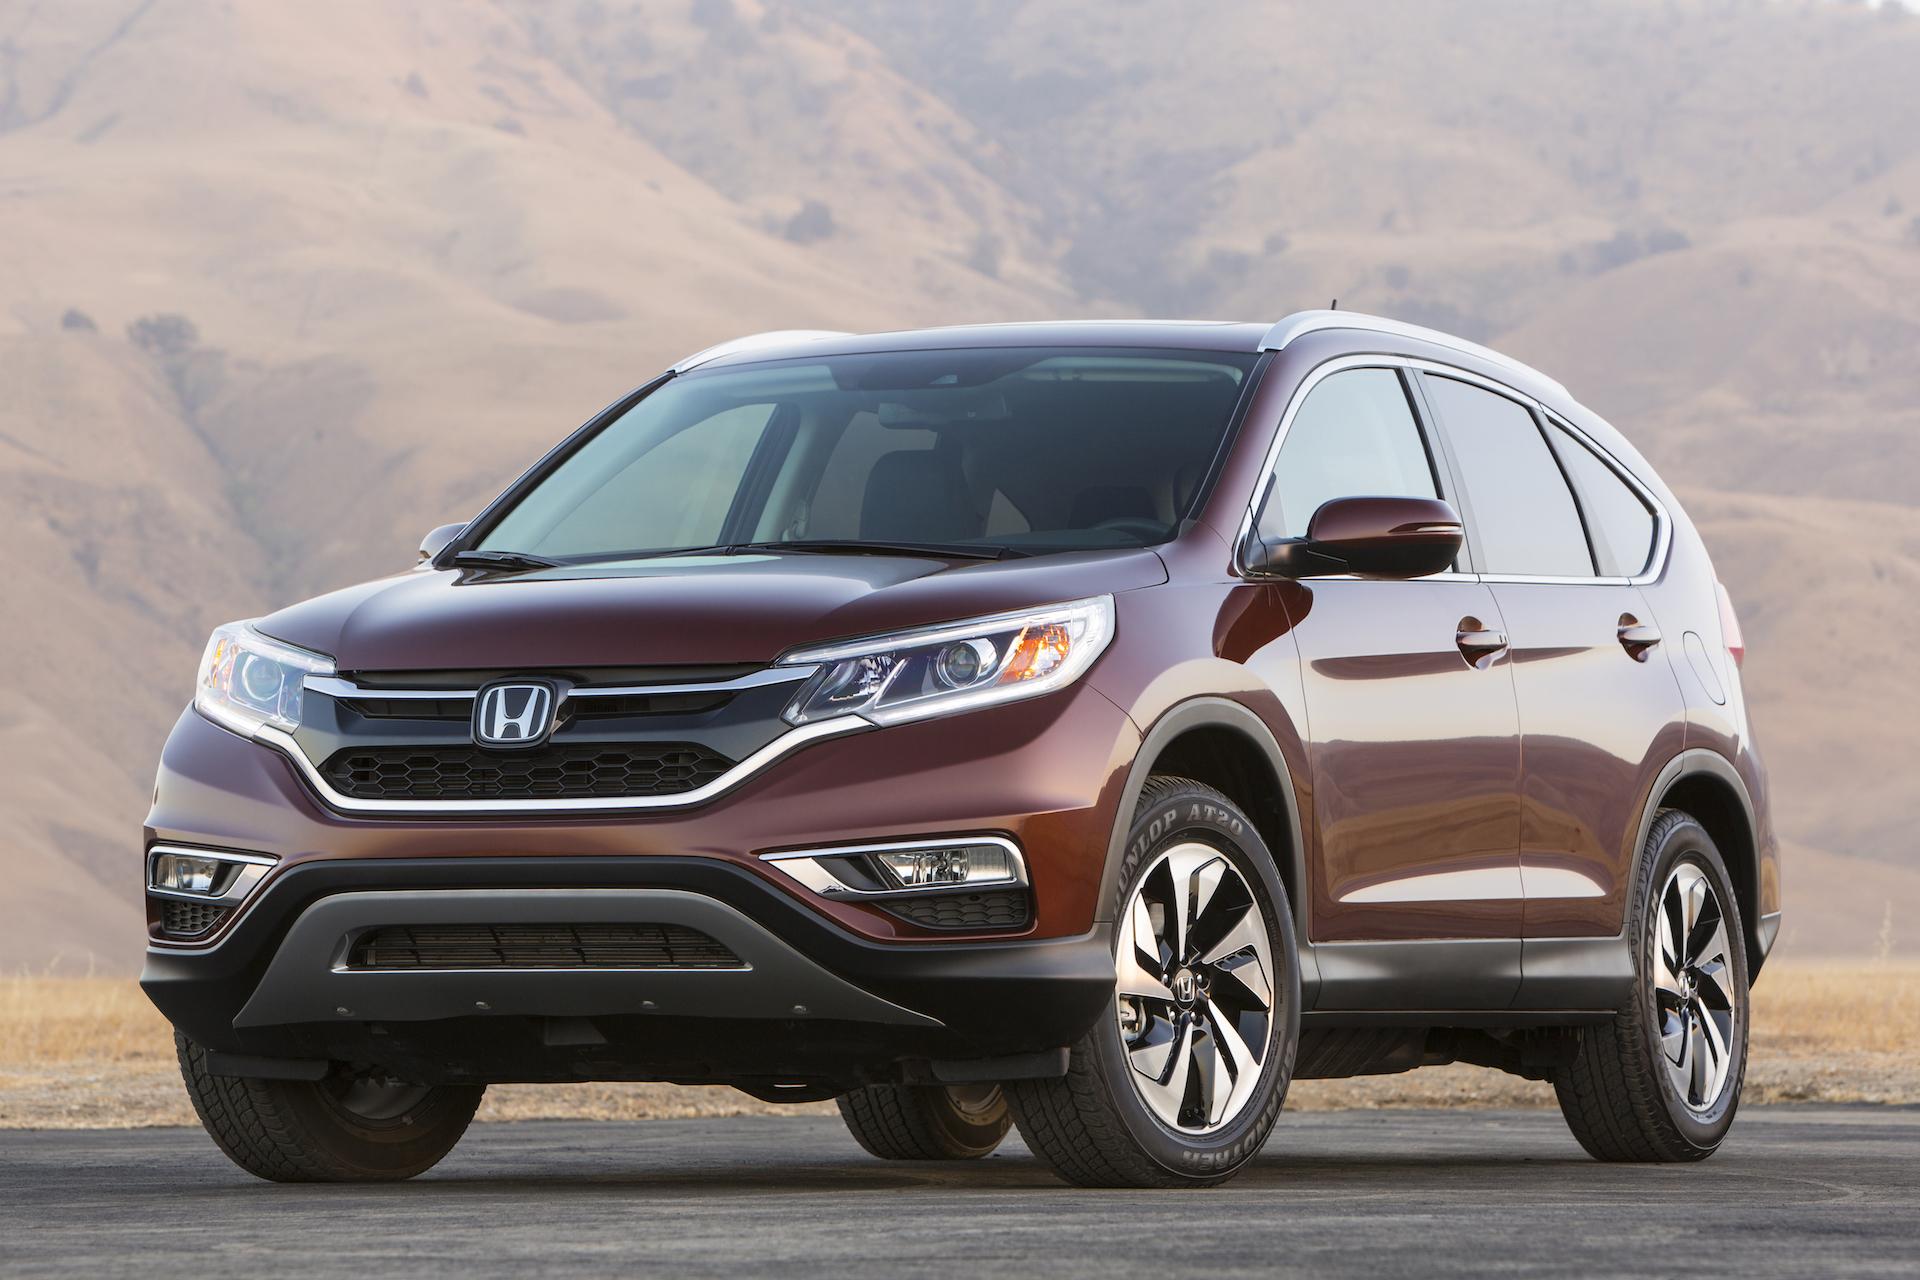 CR-Vs make dependable Honda used cars.